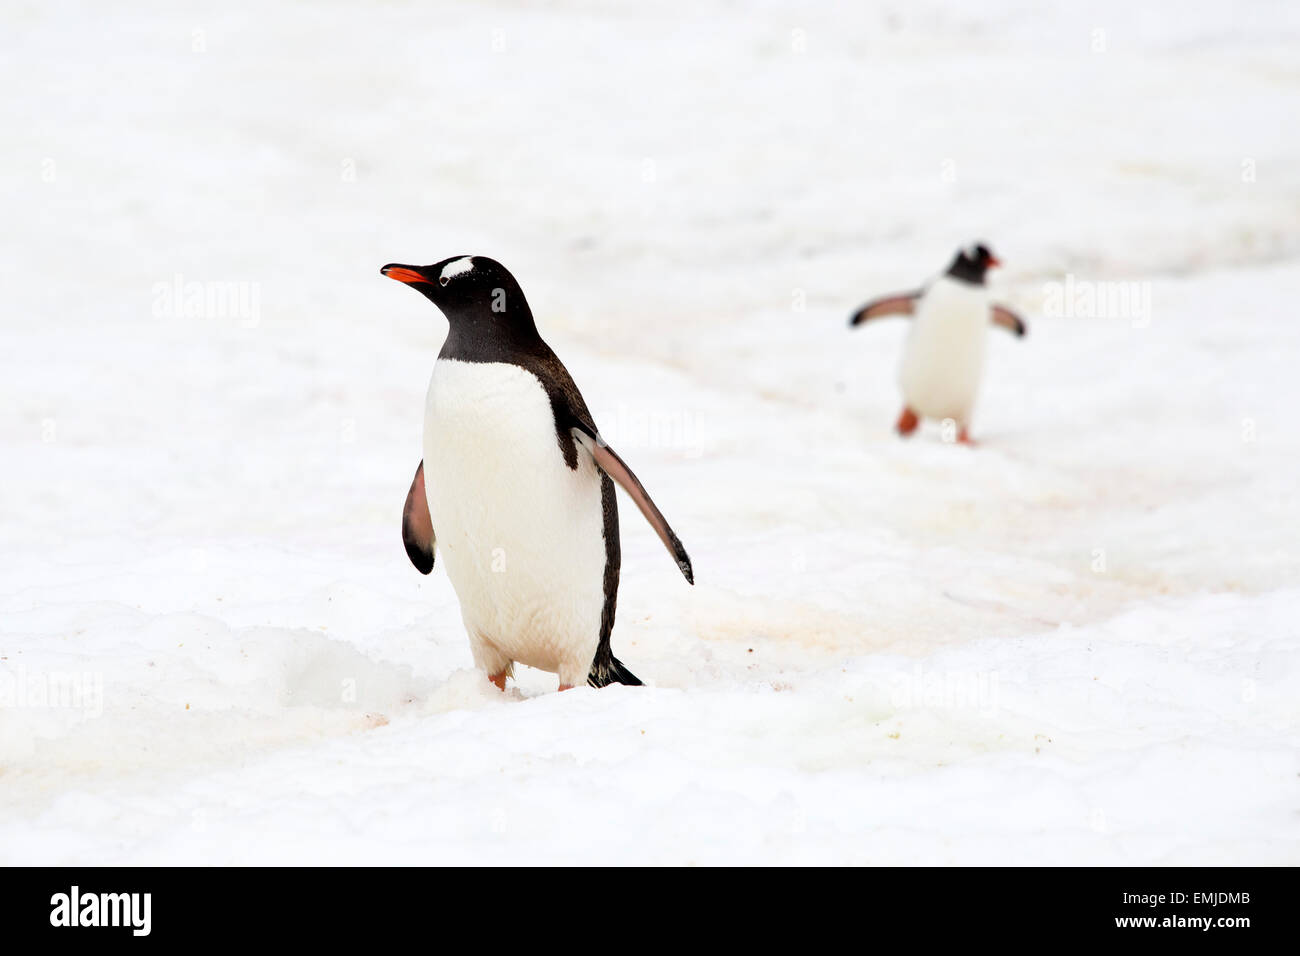 Gentoo penguins returning from sea walking up penguin track Peterman Island Antarctic Peninsular Antartica - Stock Image